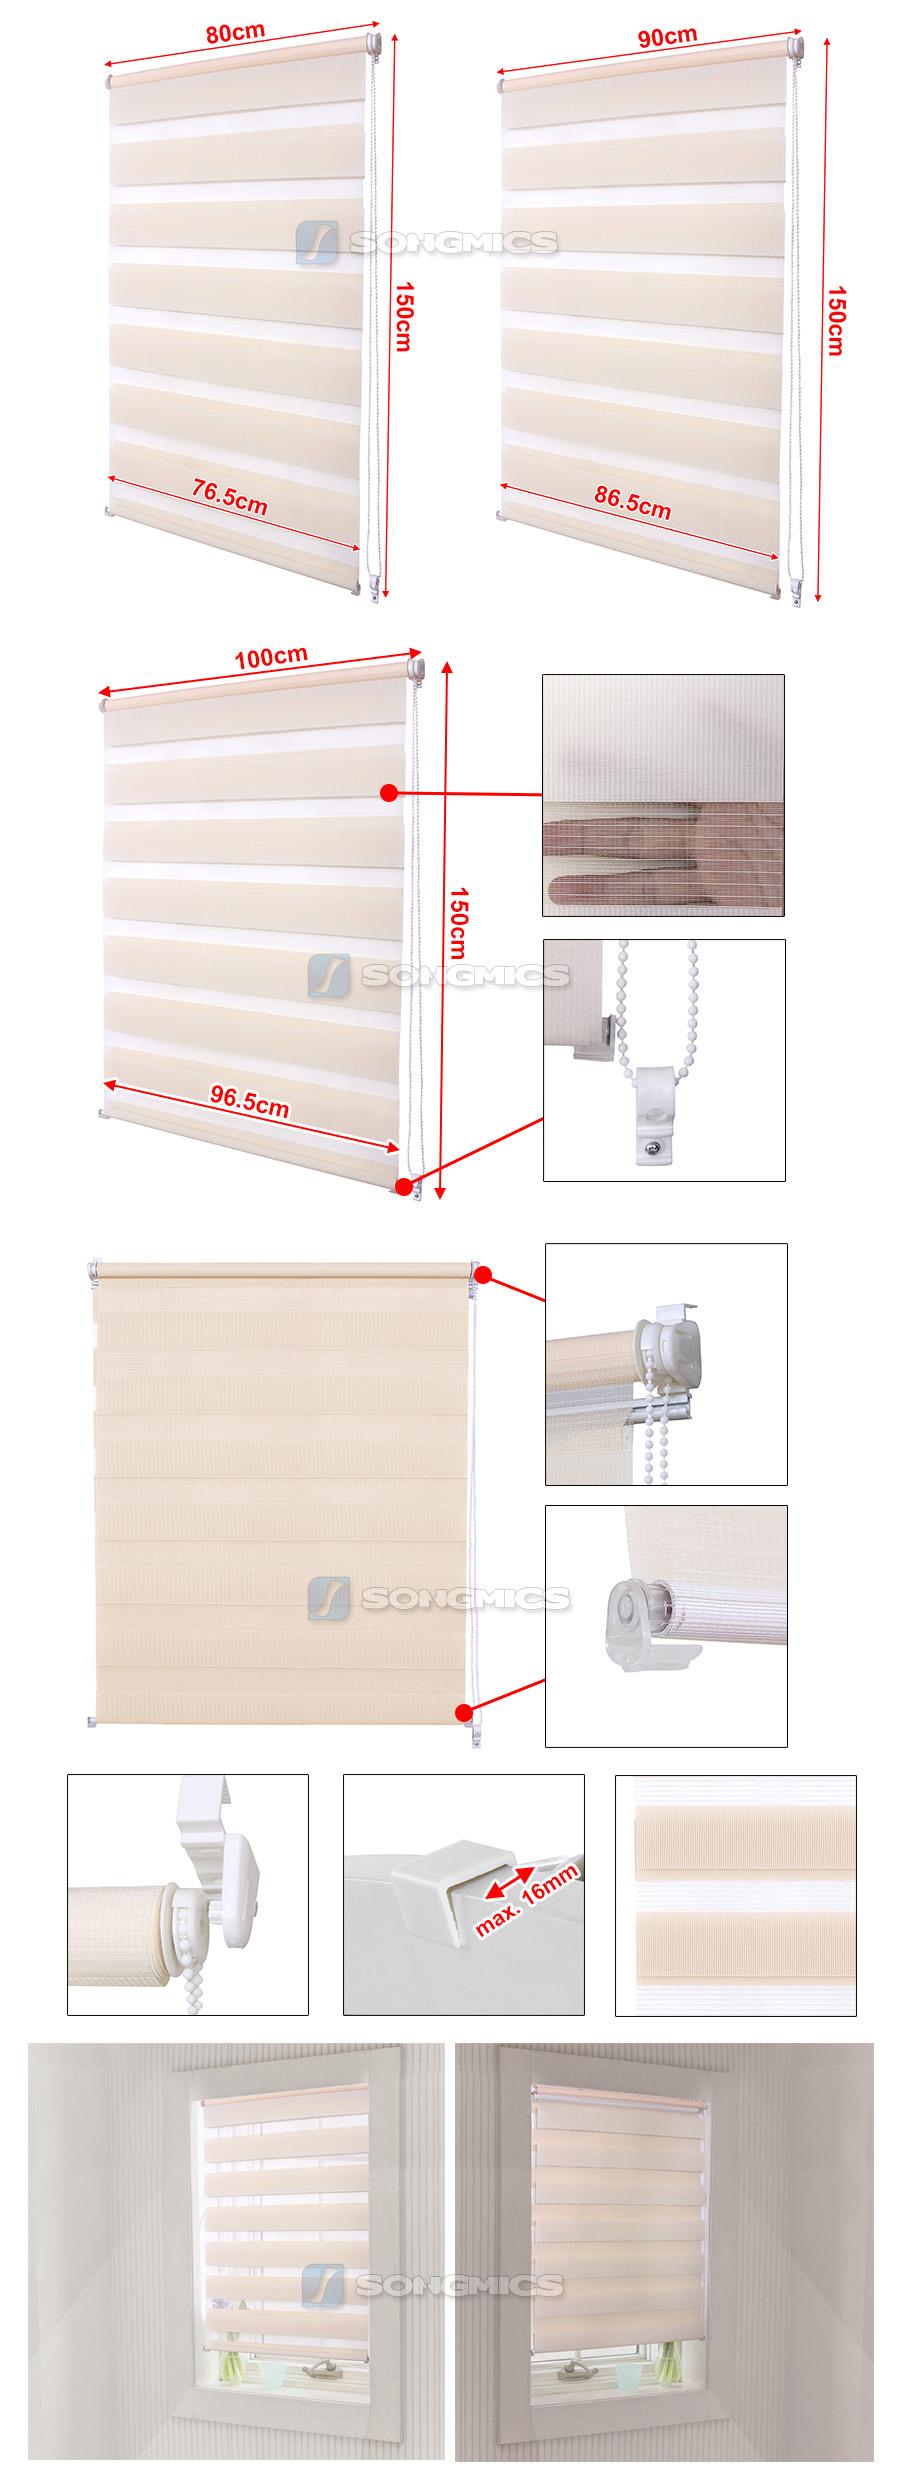 songmics doppelrollo vario klemmfix duo rollo ohne bohren mit klemmtr ger beige ebay. Black Bedroom Furniture Sets. Home Design Ideas